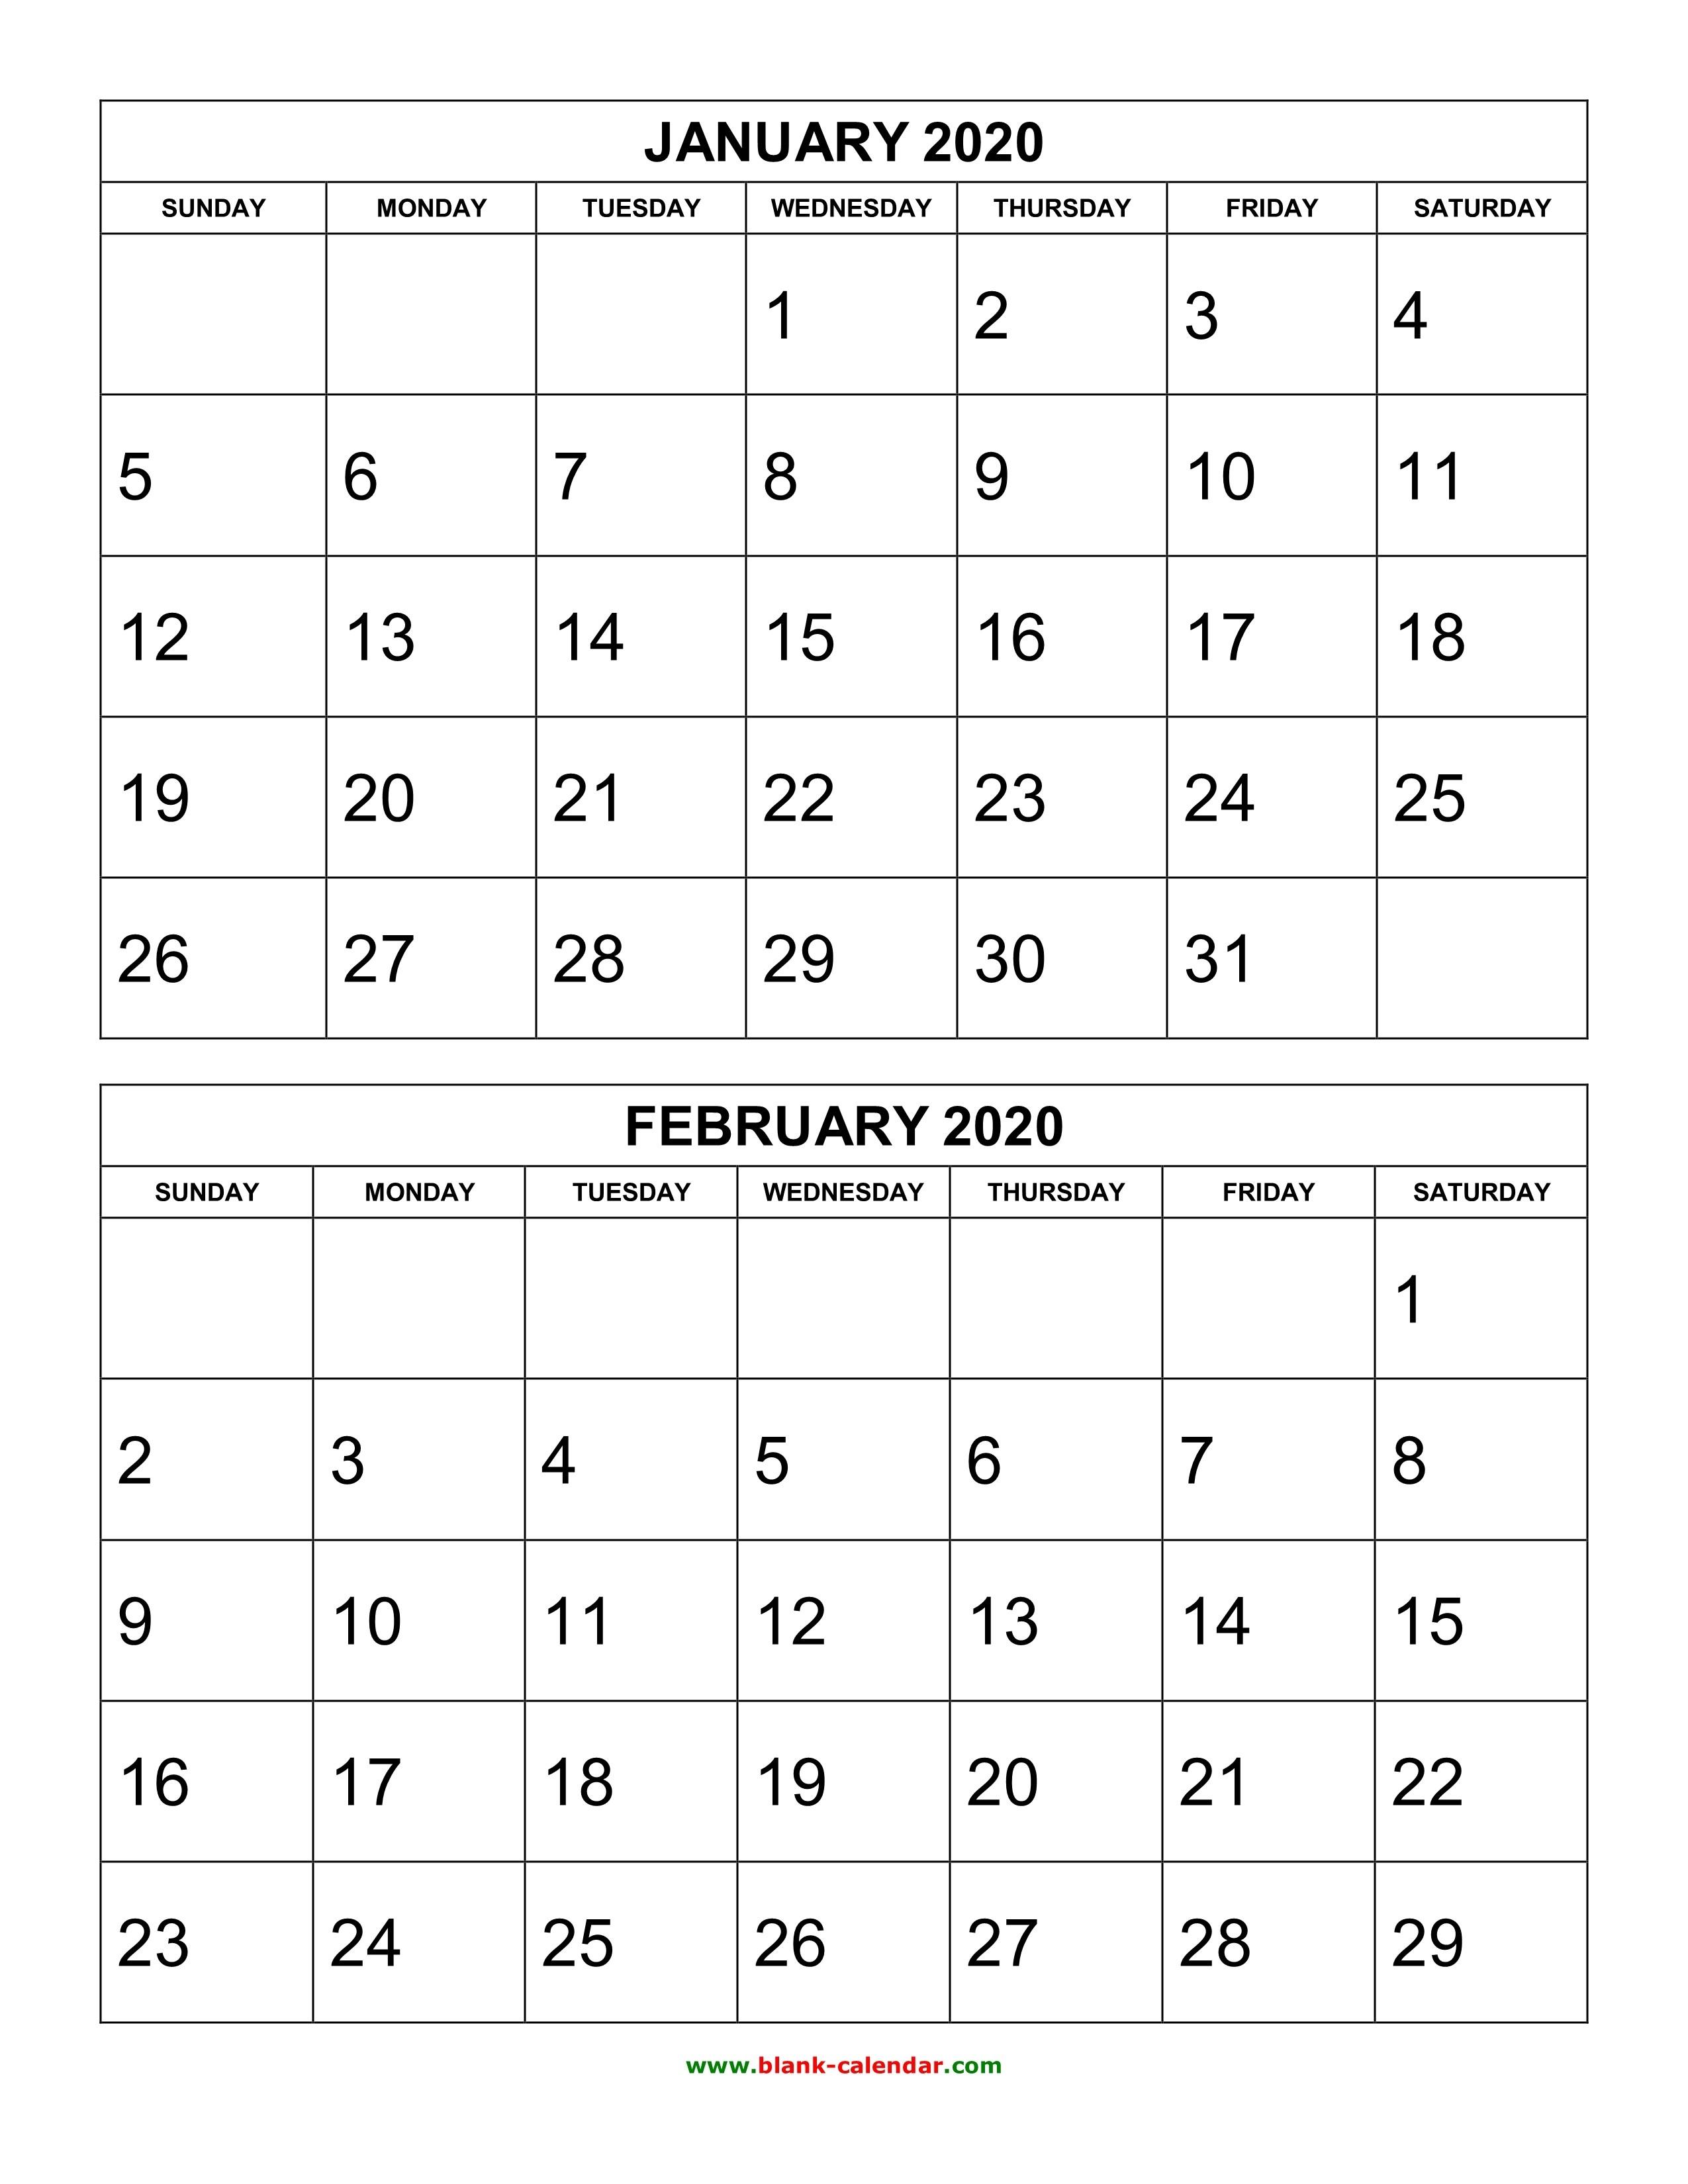 Free Download Printable Calendar 2020, 2 Months Per Page, 6-Blank 2020 Calendar Printable 2 Month